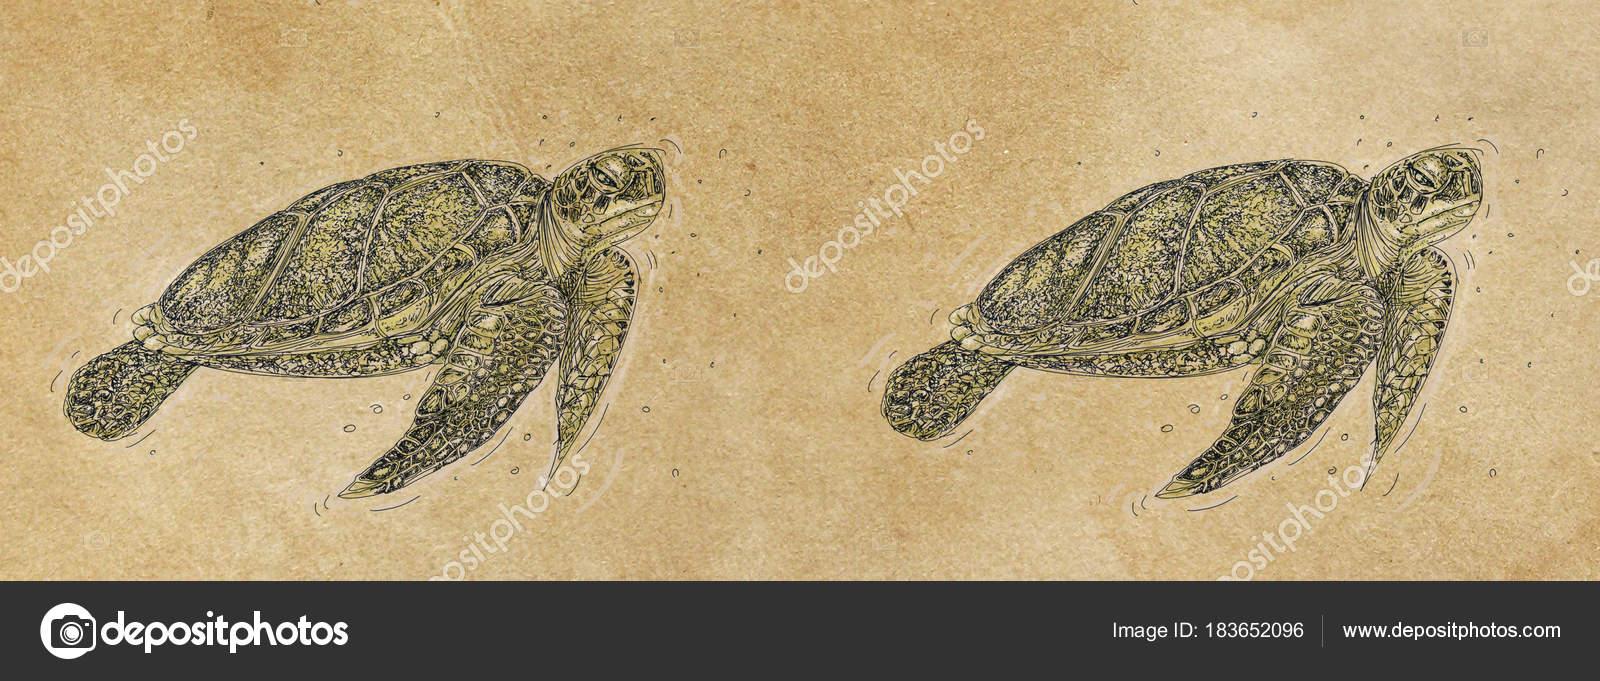 Banners Templates Design Sea Turtle Swimming Vintage Stock Photo